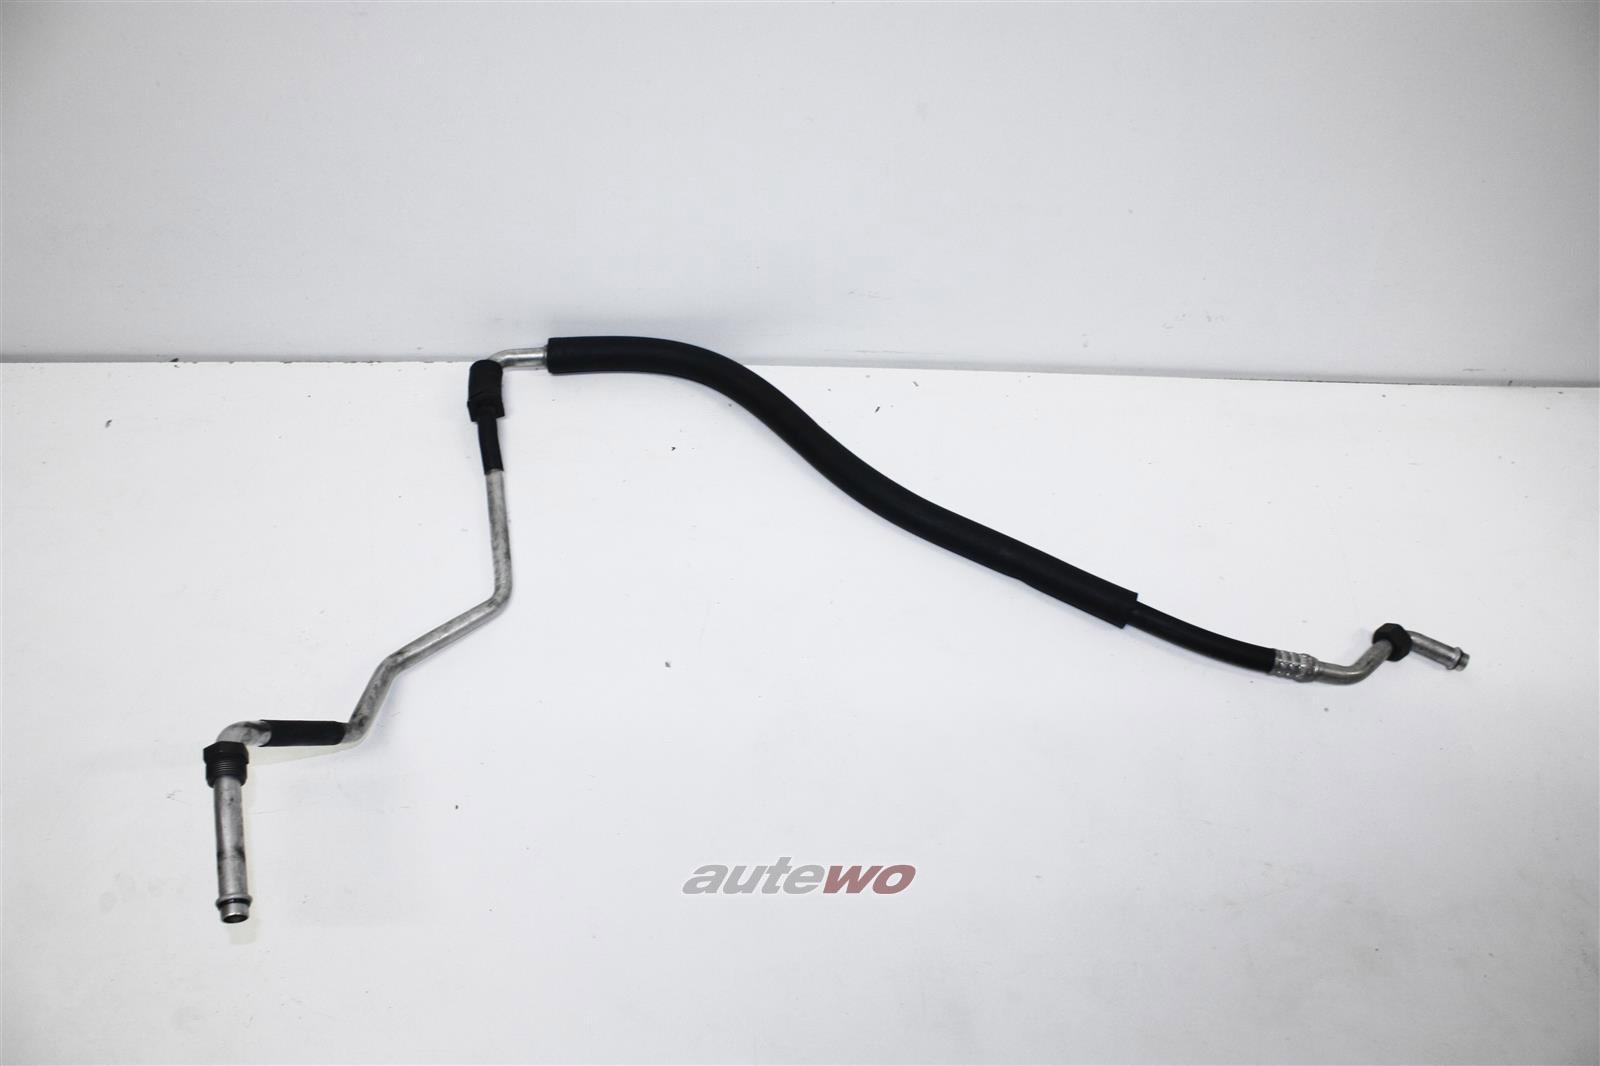 Audi V8 D11 3.6-4.2l Klima Kältemittelschlauch Verd. > Ventileinheit 441260707B